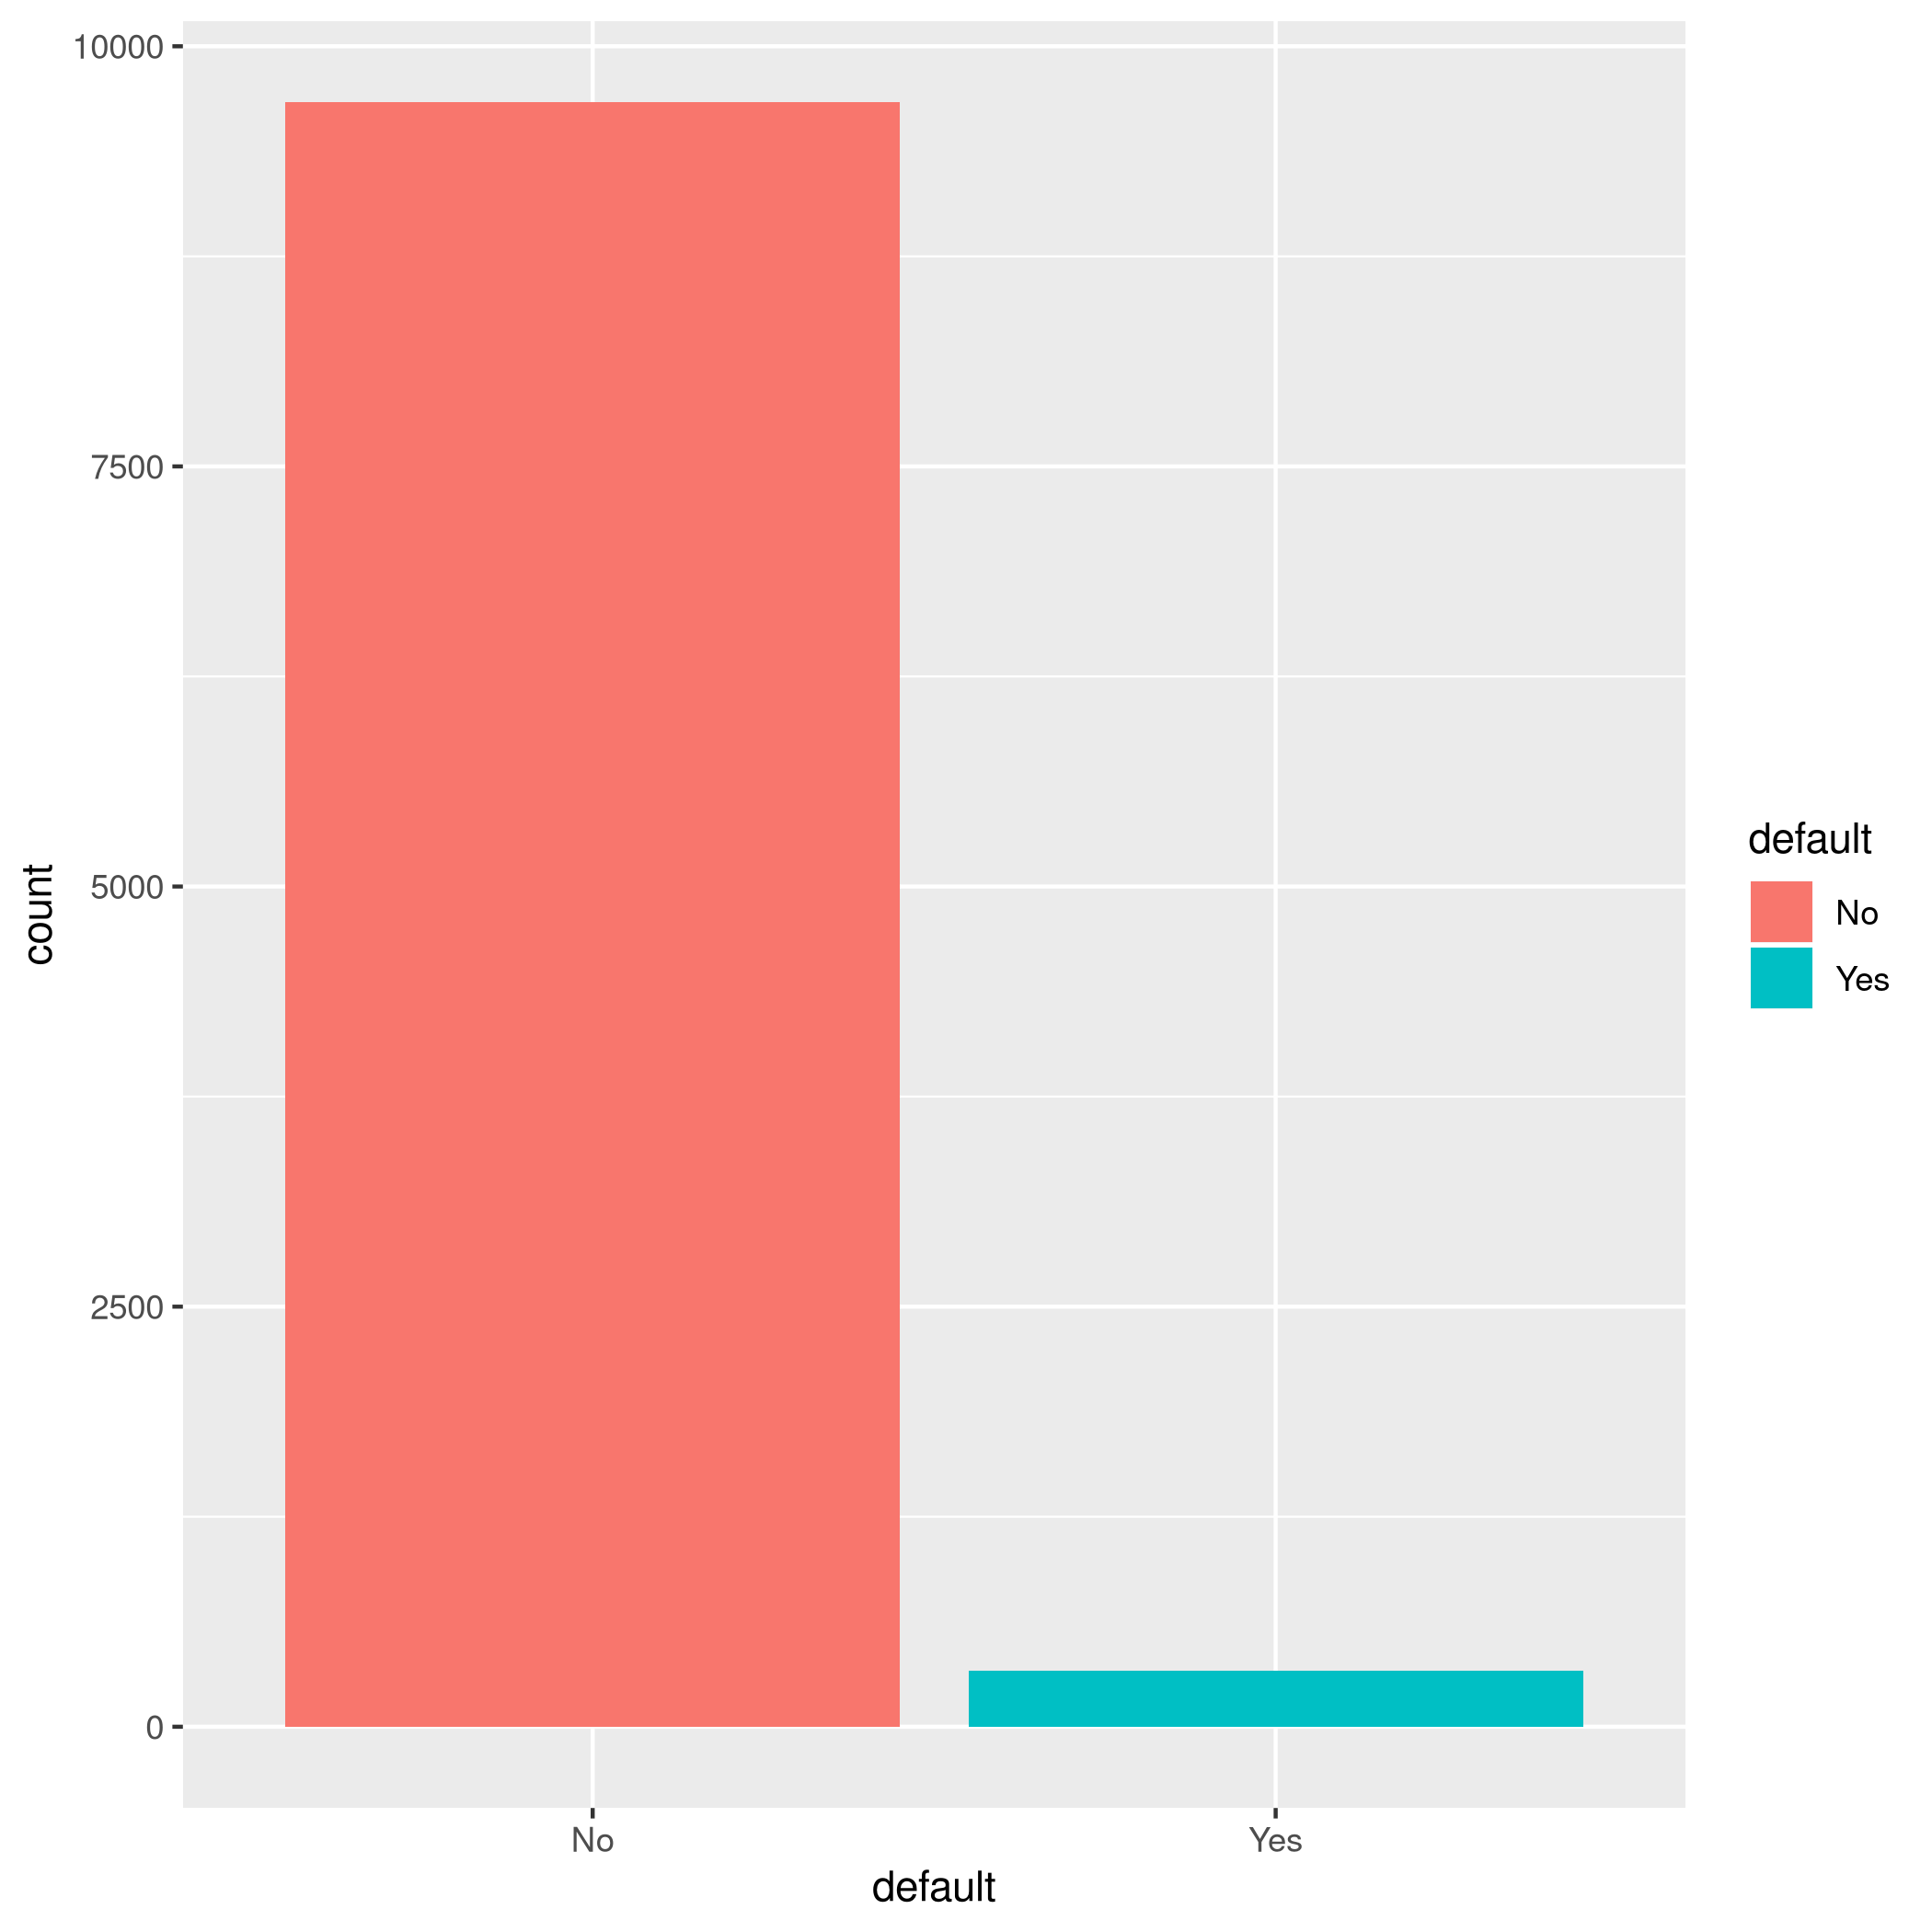 Figure 1: MLR3 Visualizations